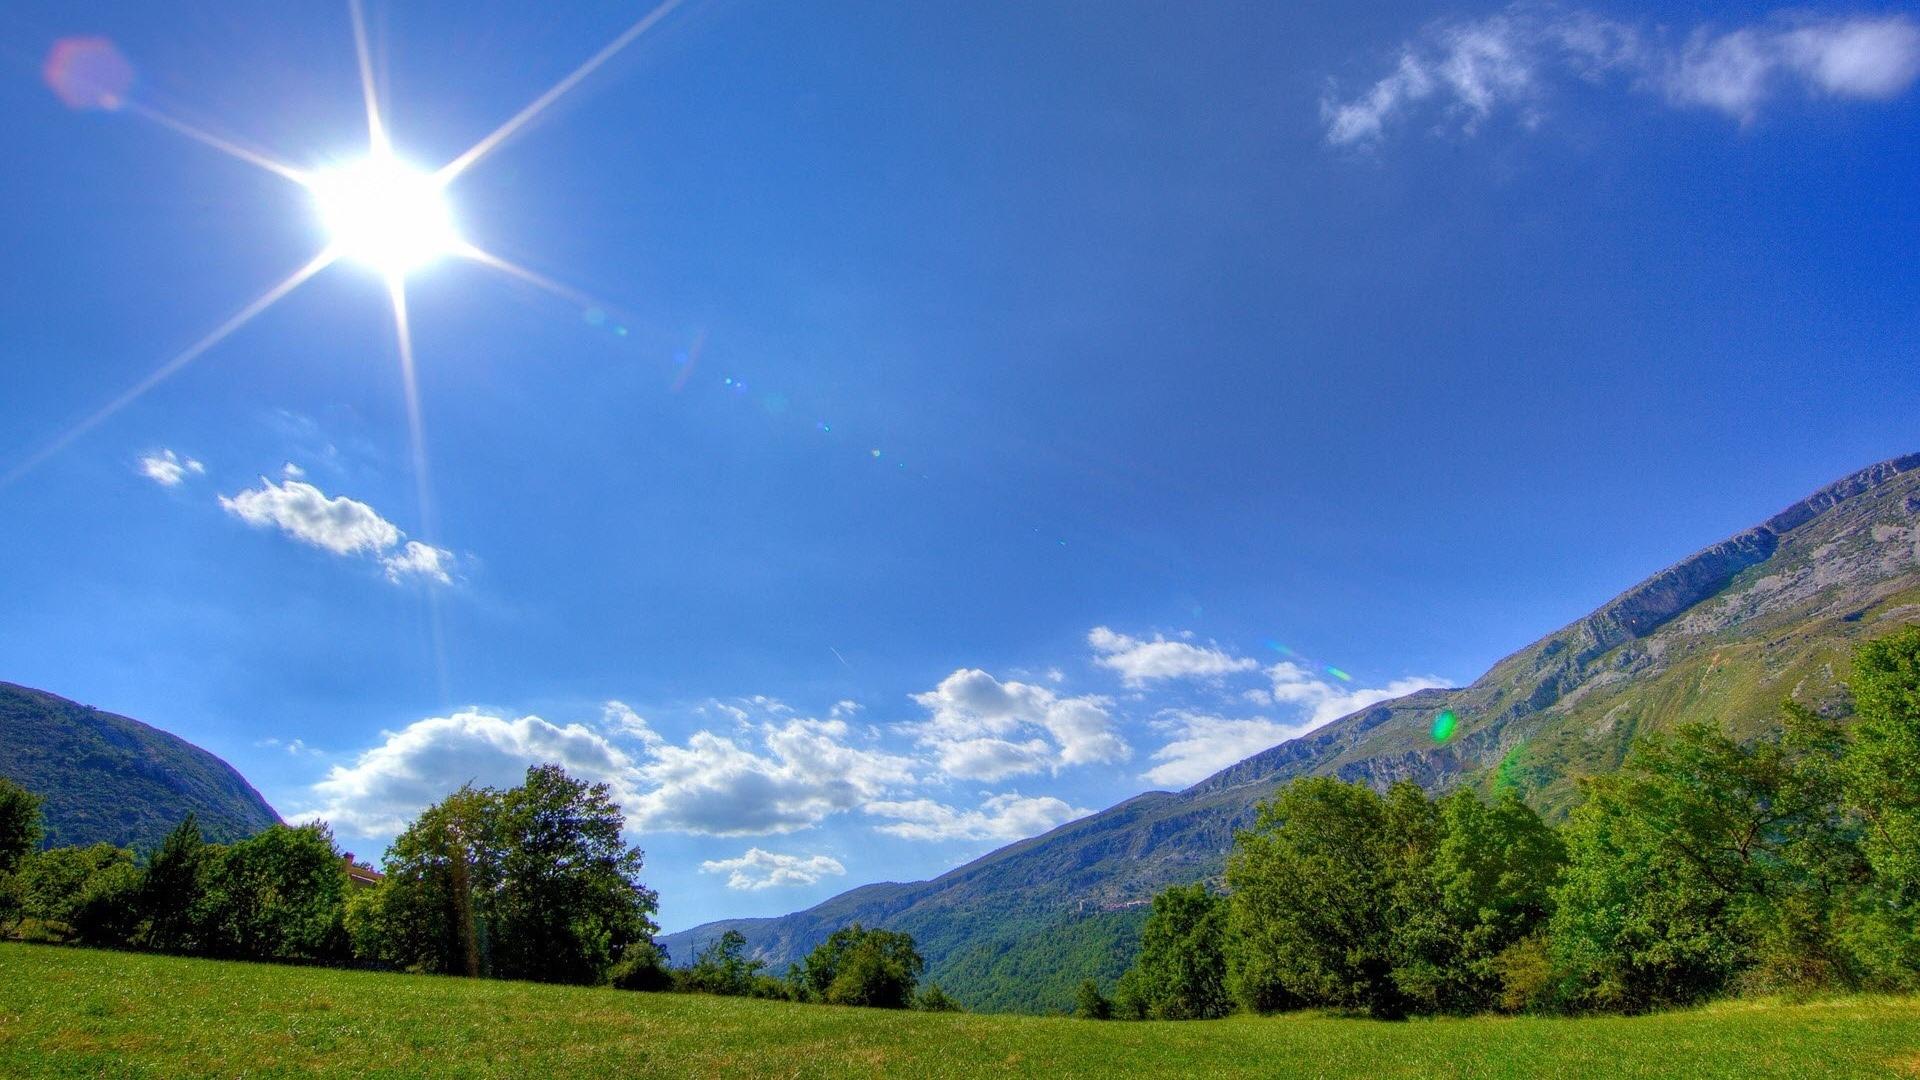 Sunny Day HD Wallpaper